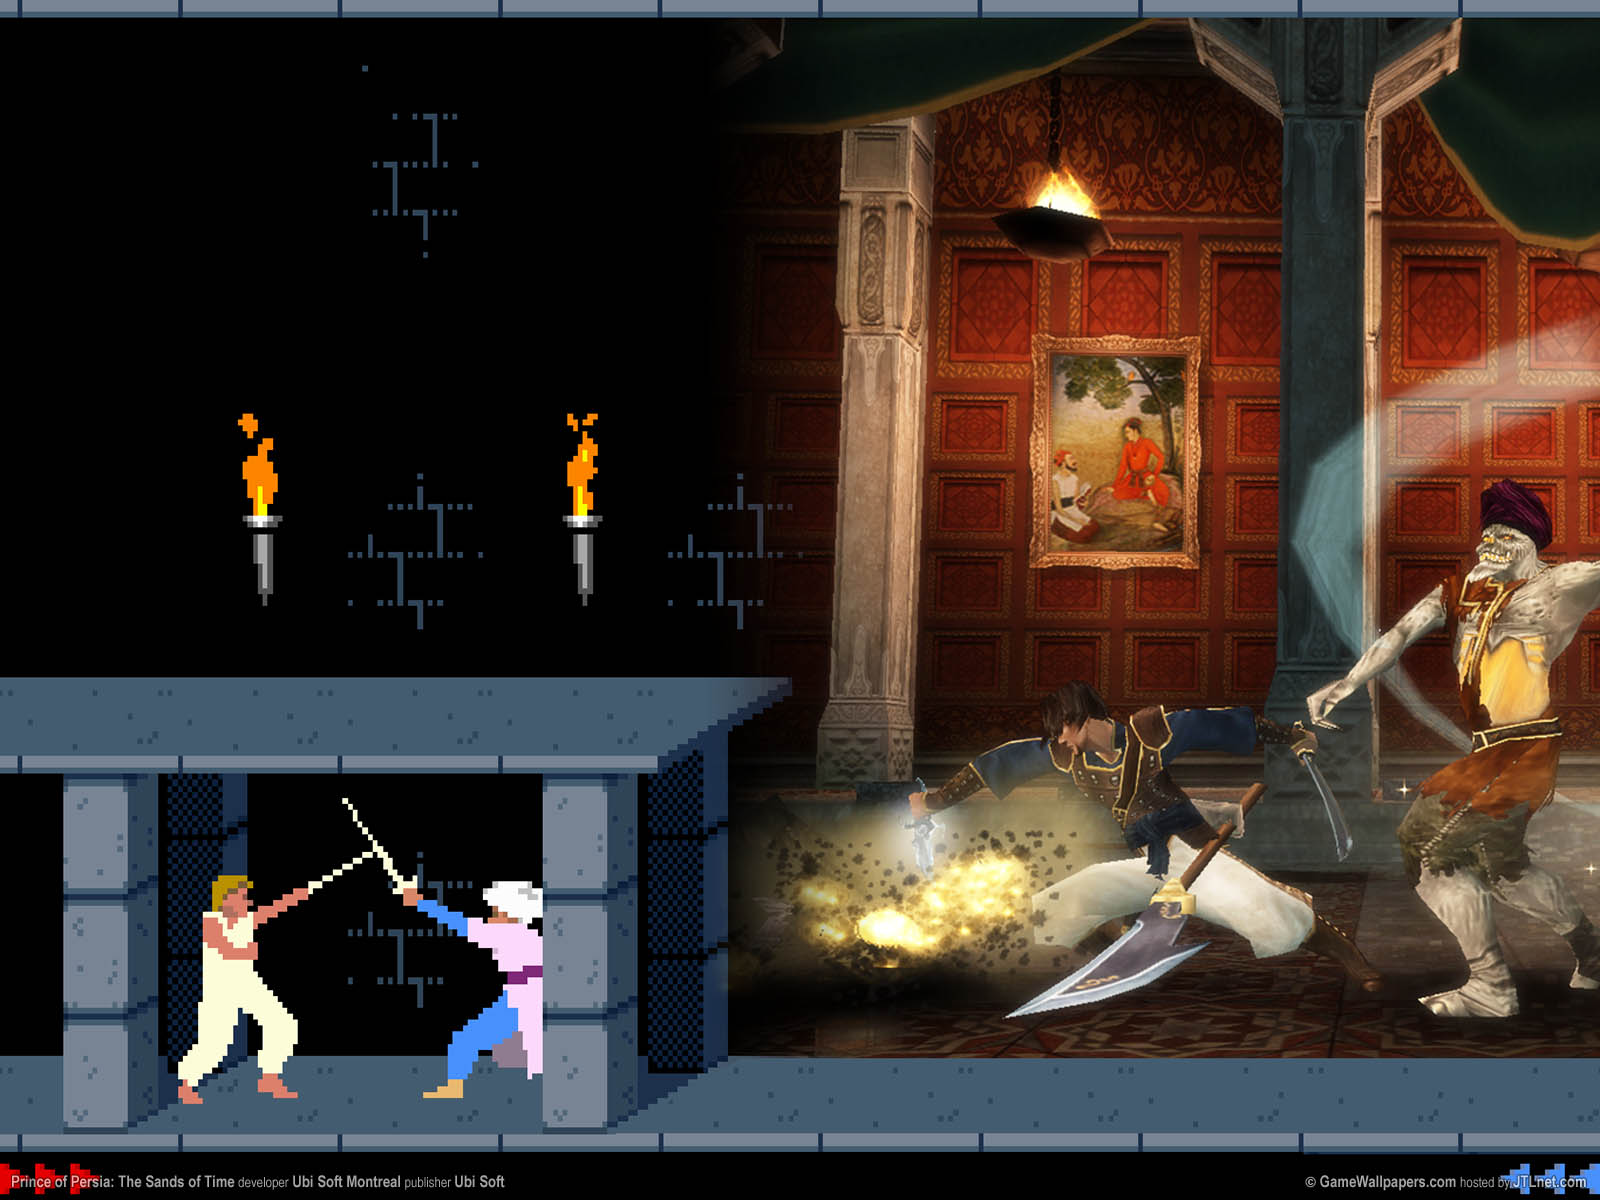 Prince of Persia: The Sands of Time Hintergrundbild 05 1600x1200